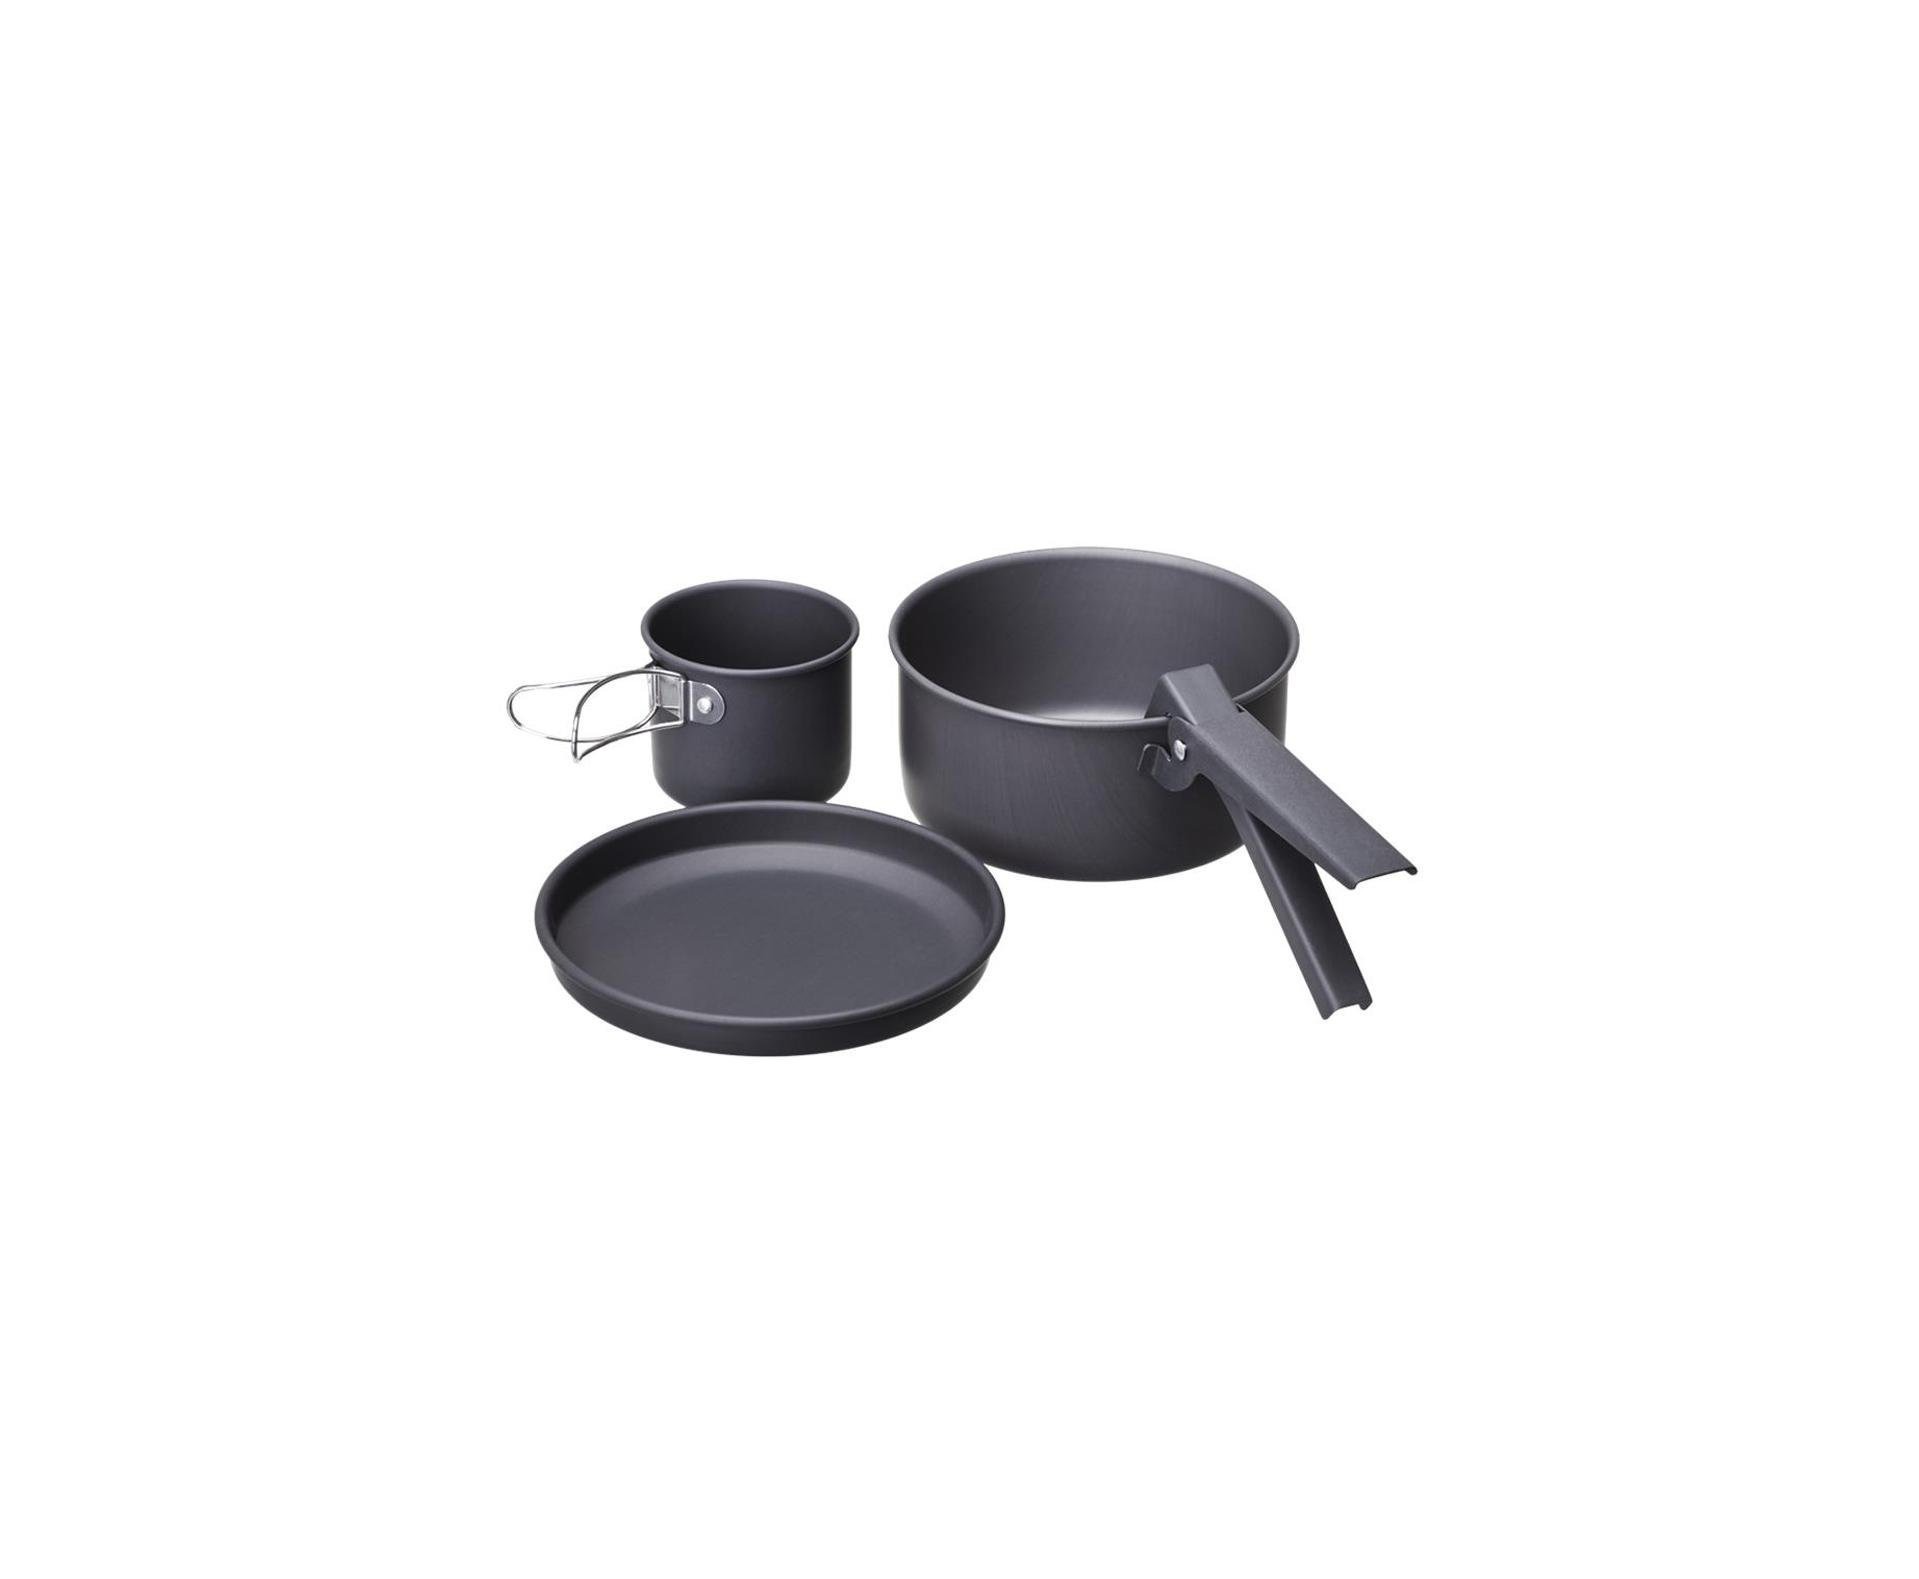 Kit Cozinha Camping Alumínio - 4 Pçs - Guepardo